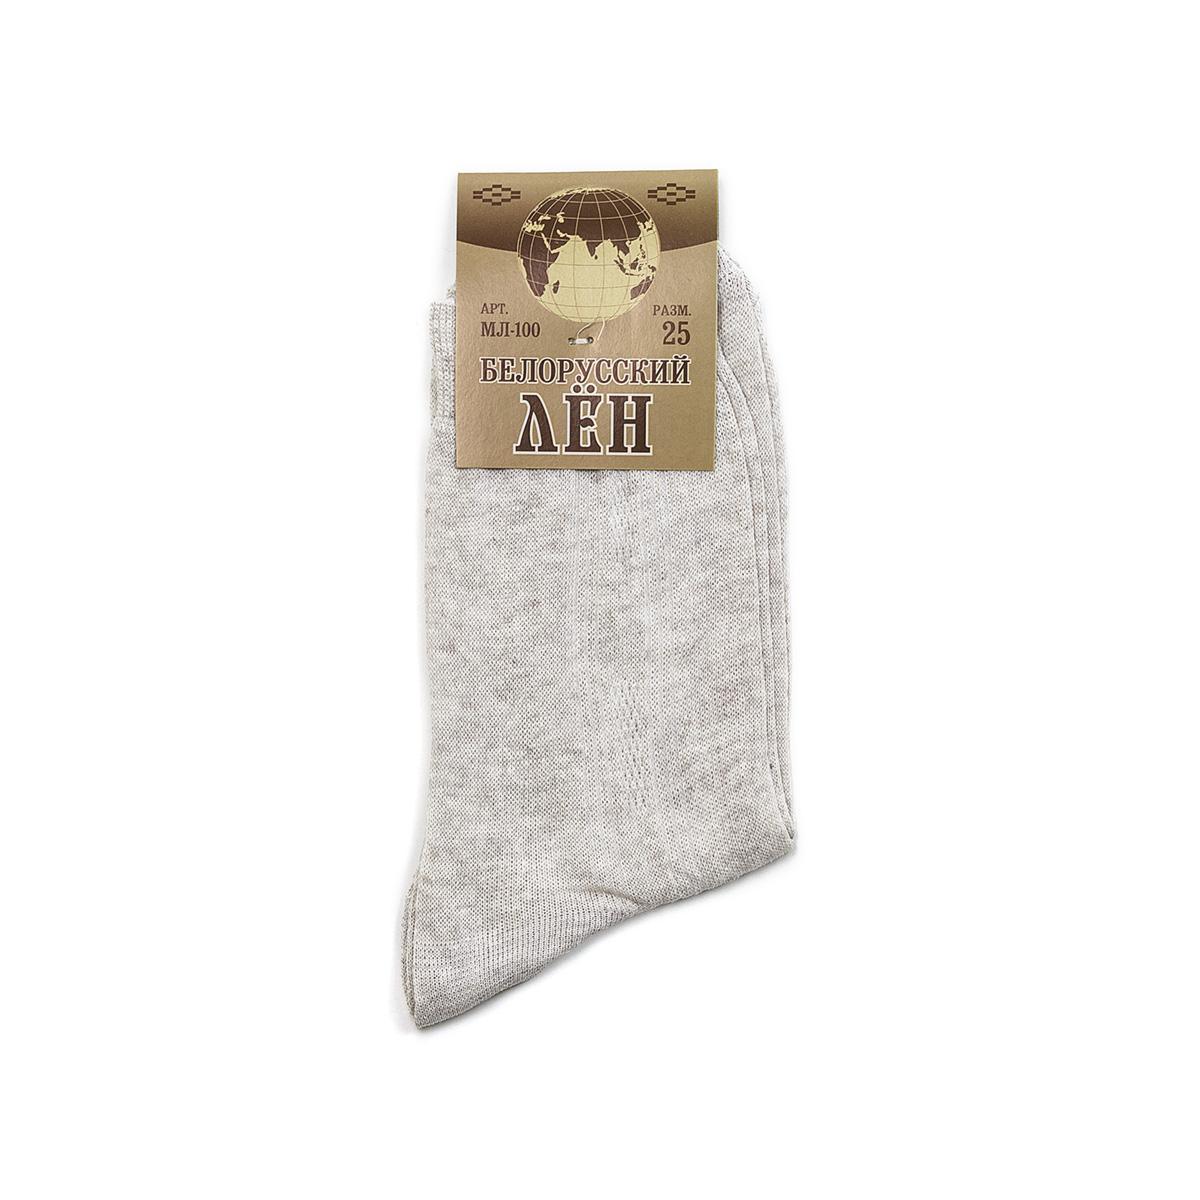 Носки мужские Лен арт. 0870, размер 39-40Носки<br><br><br>Тип: Муж. носки<br>Размер: 39-40<br>Материал: Лен